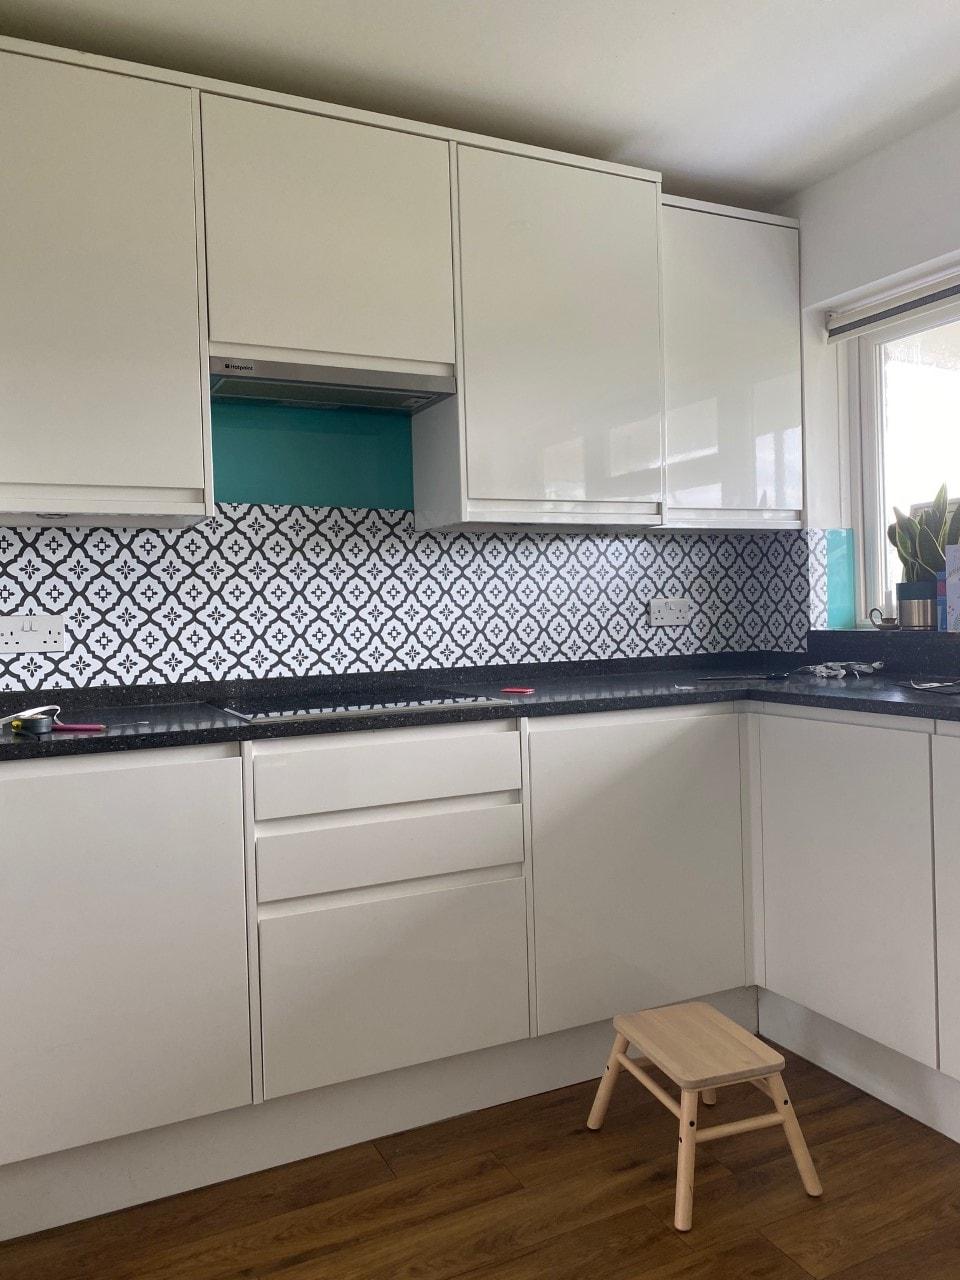 backsplash, padrão, cozinha